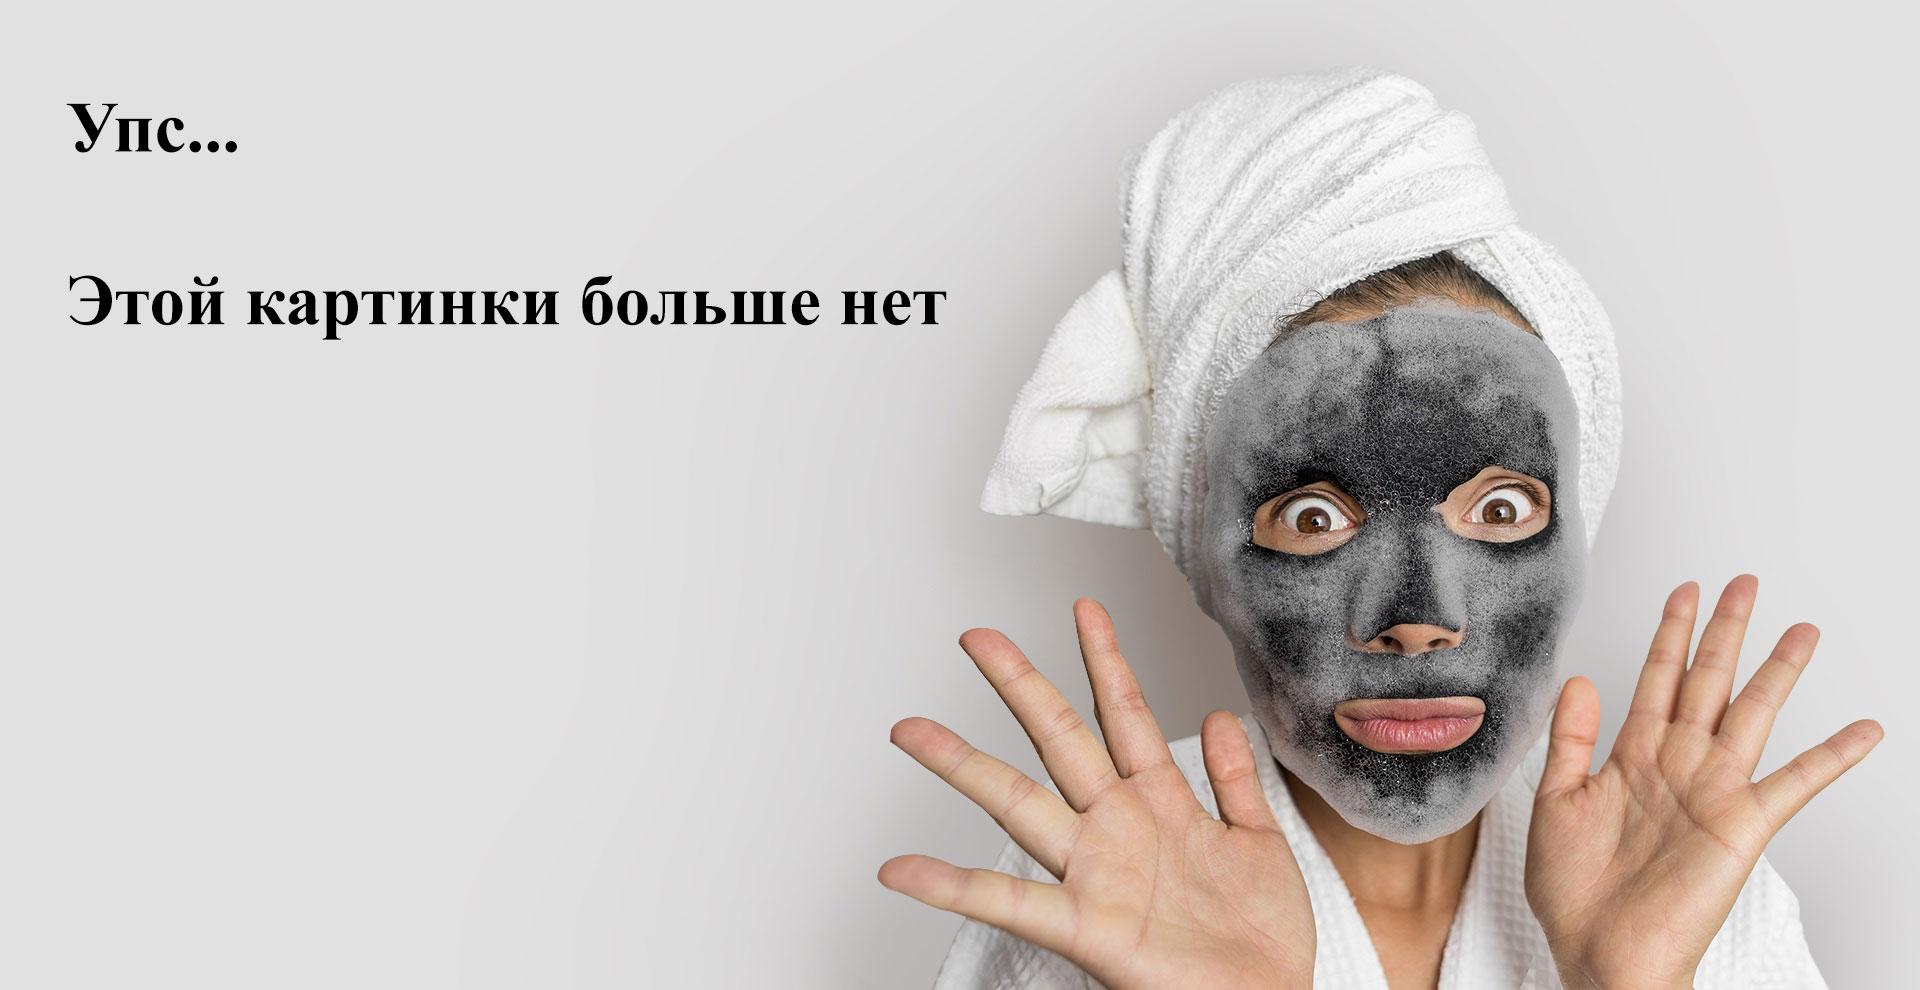 Patrisa Nail, Гель-лак Московская сага №749